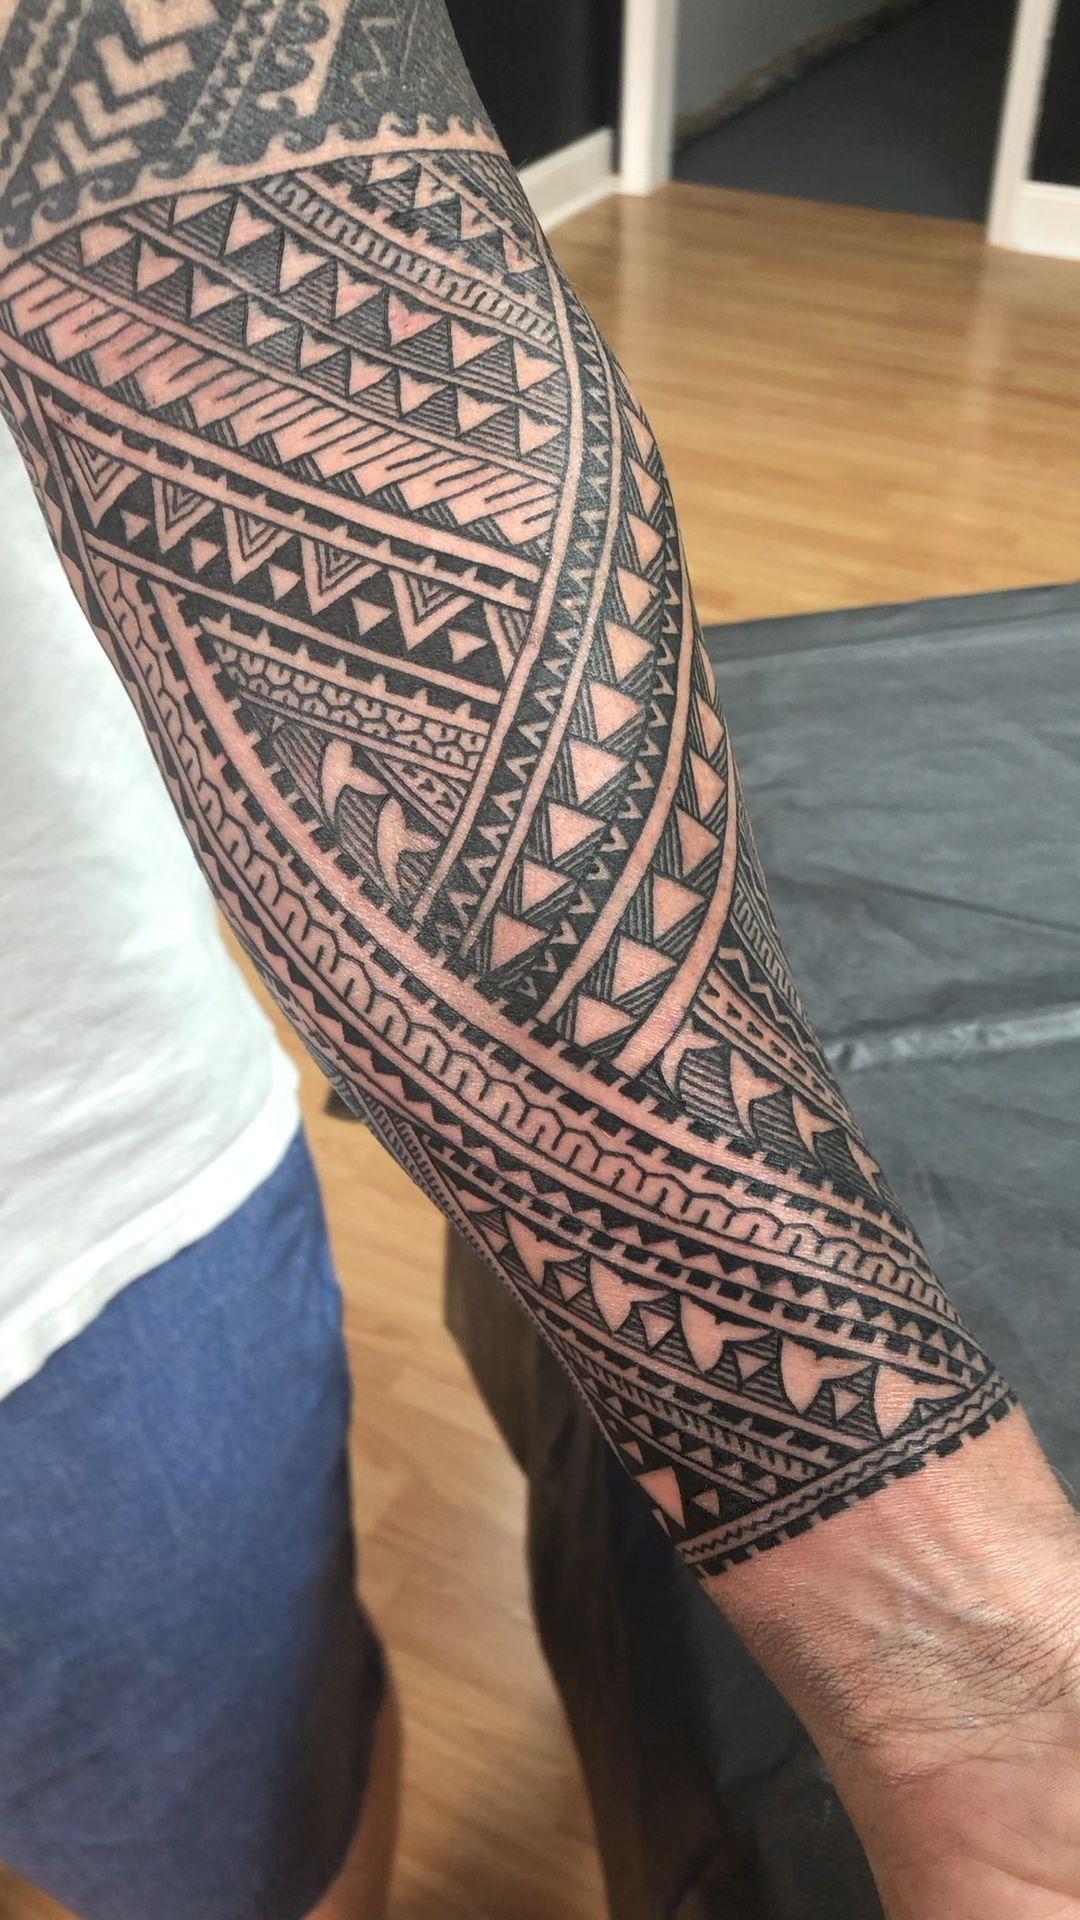 Forearm band tattoo Linda band forearm MaoriTattoos